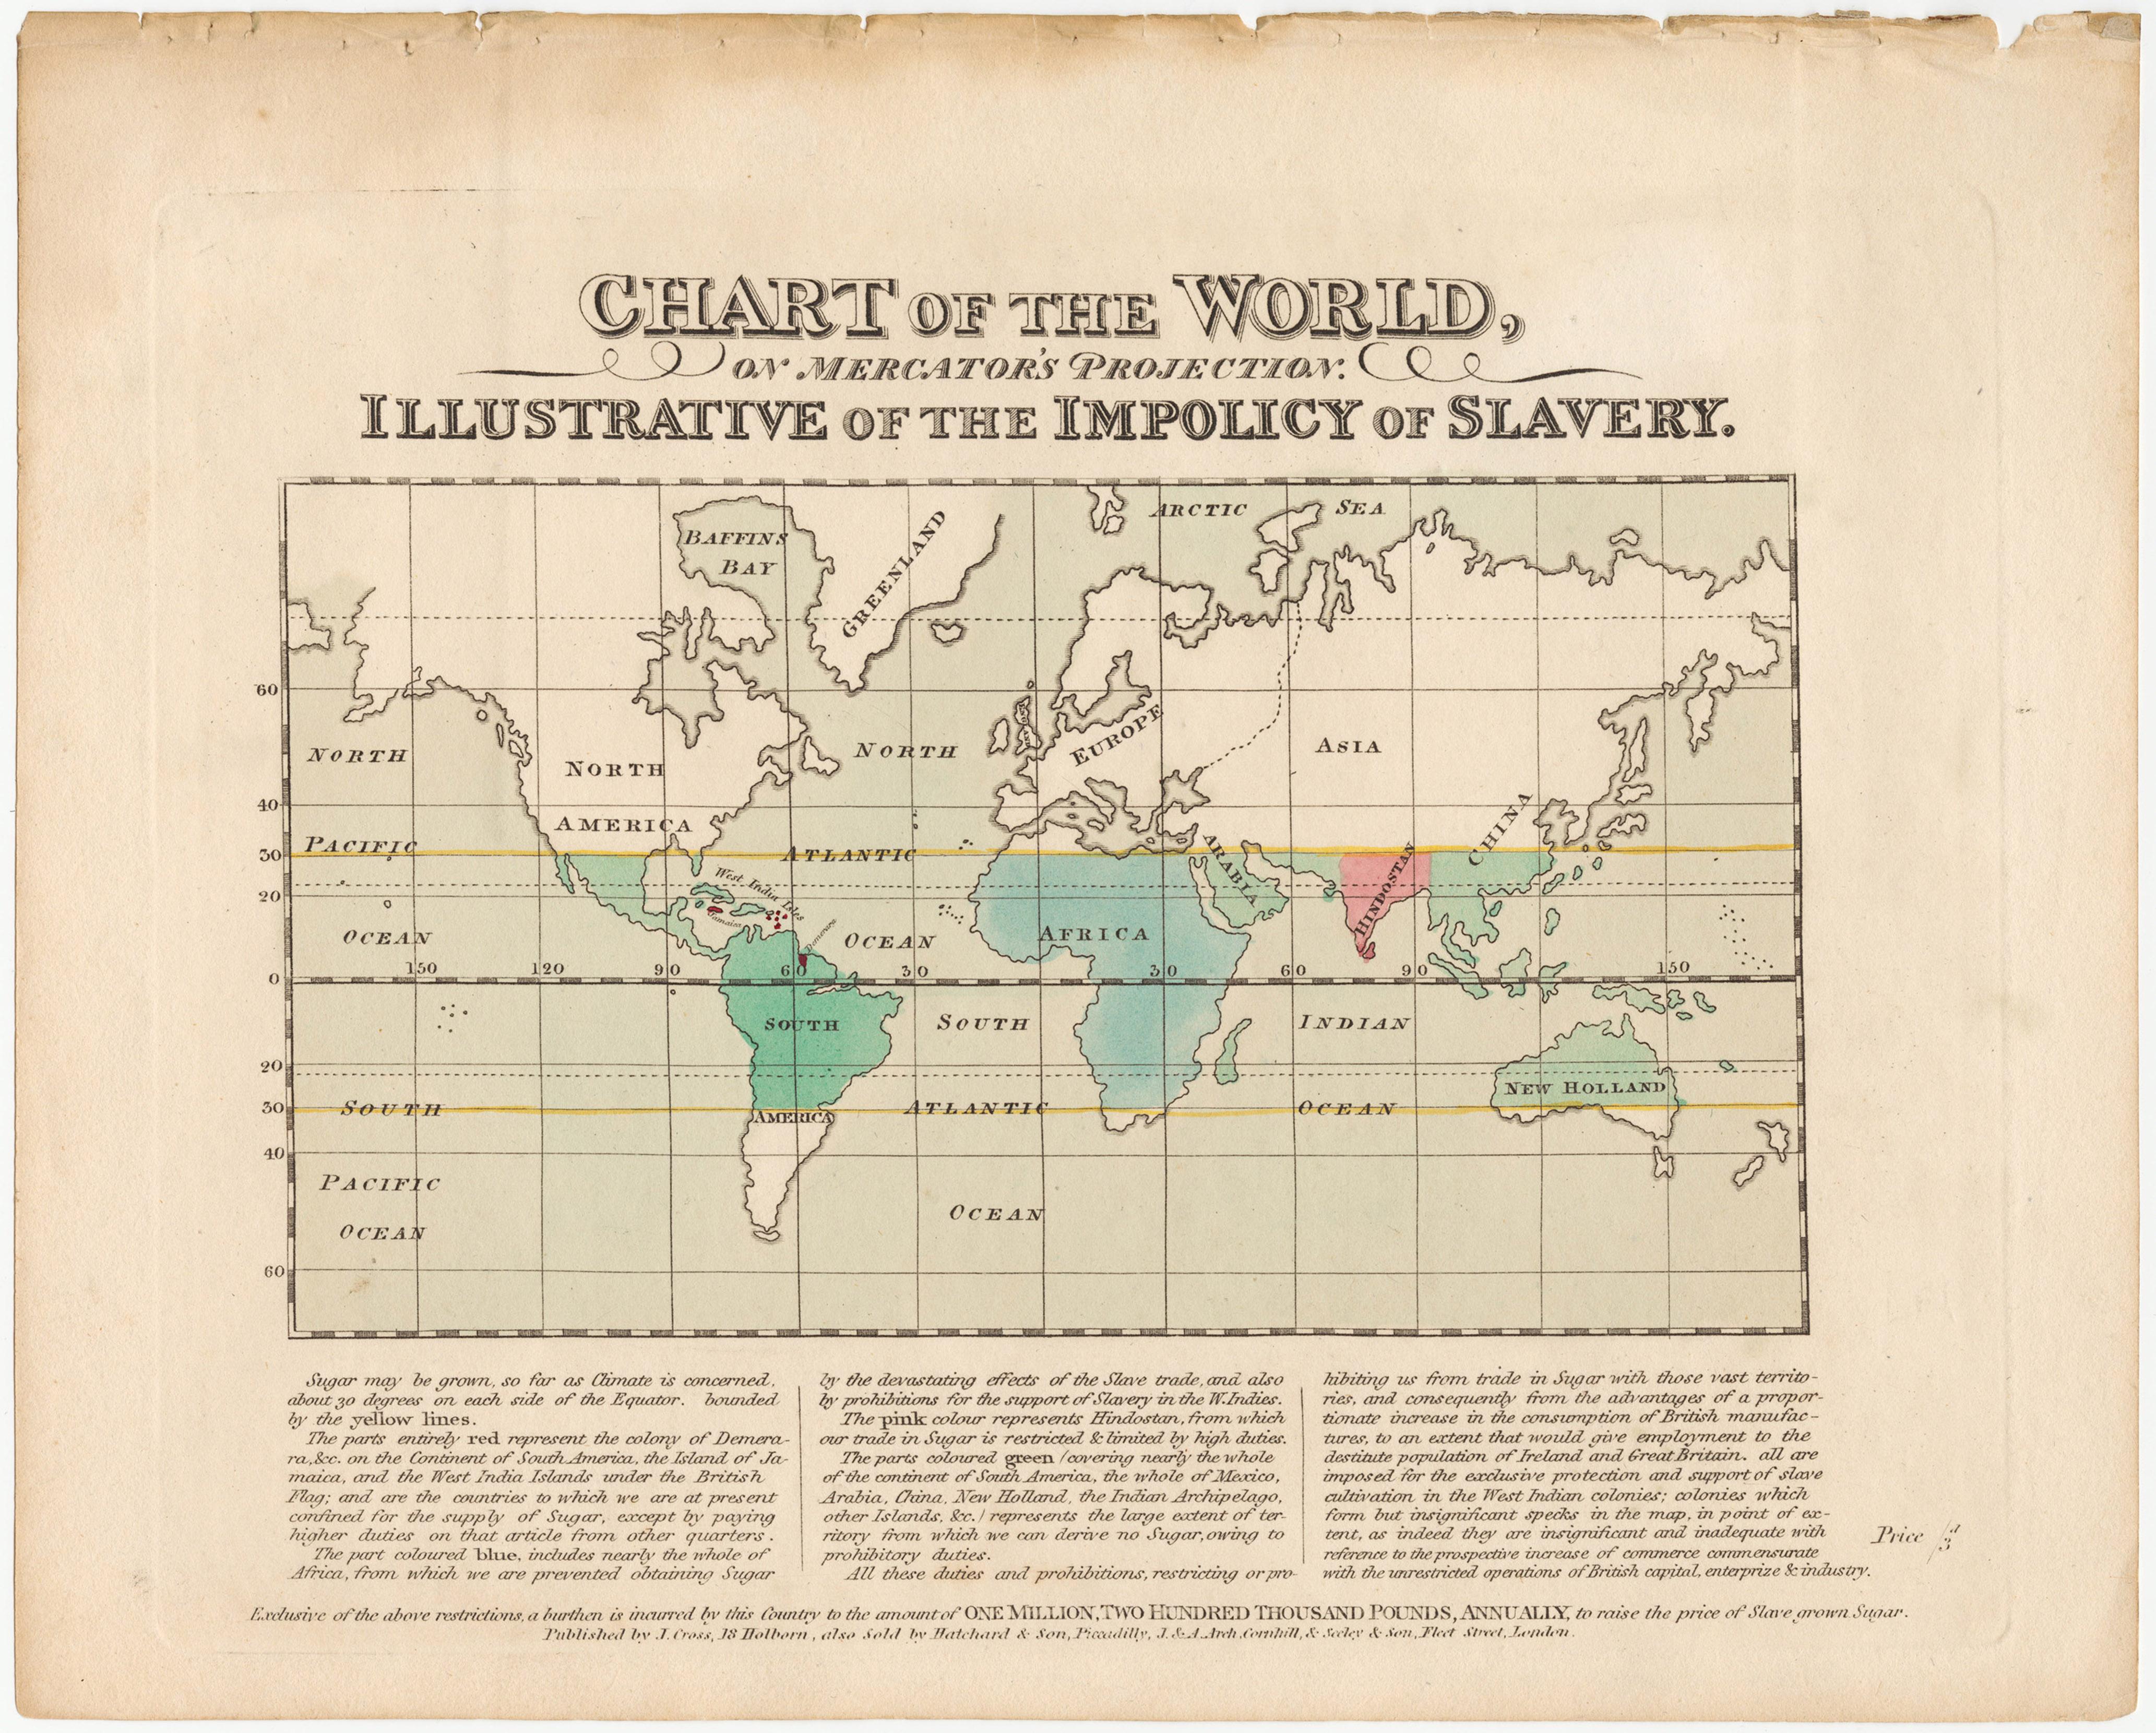 Manufacturing Organizational Chart: Joseph Cross The Impolicy of Slavery 1823 Cornell CUL PJM ,Chart